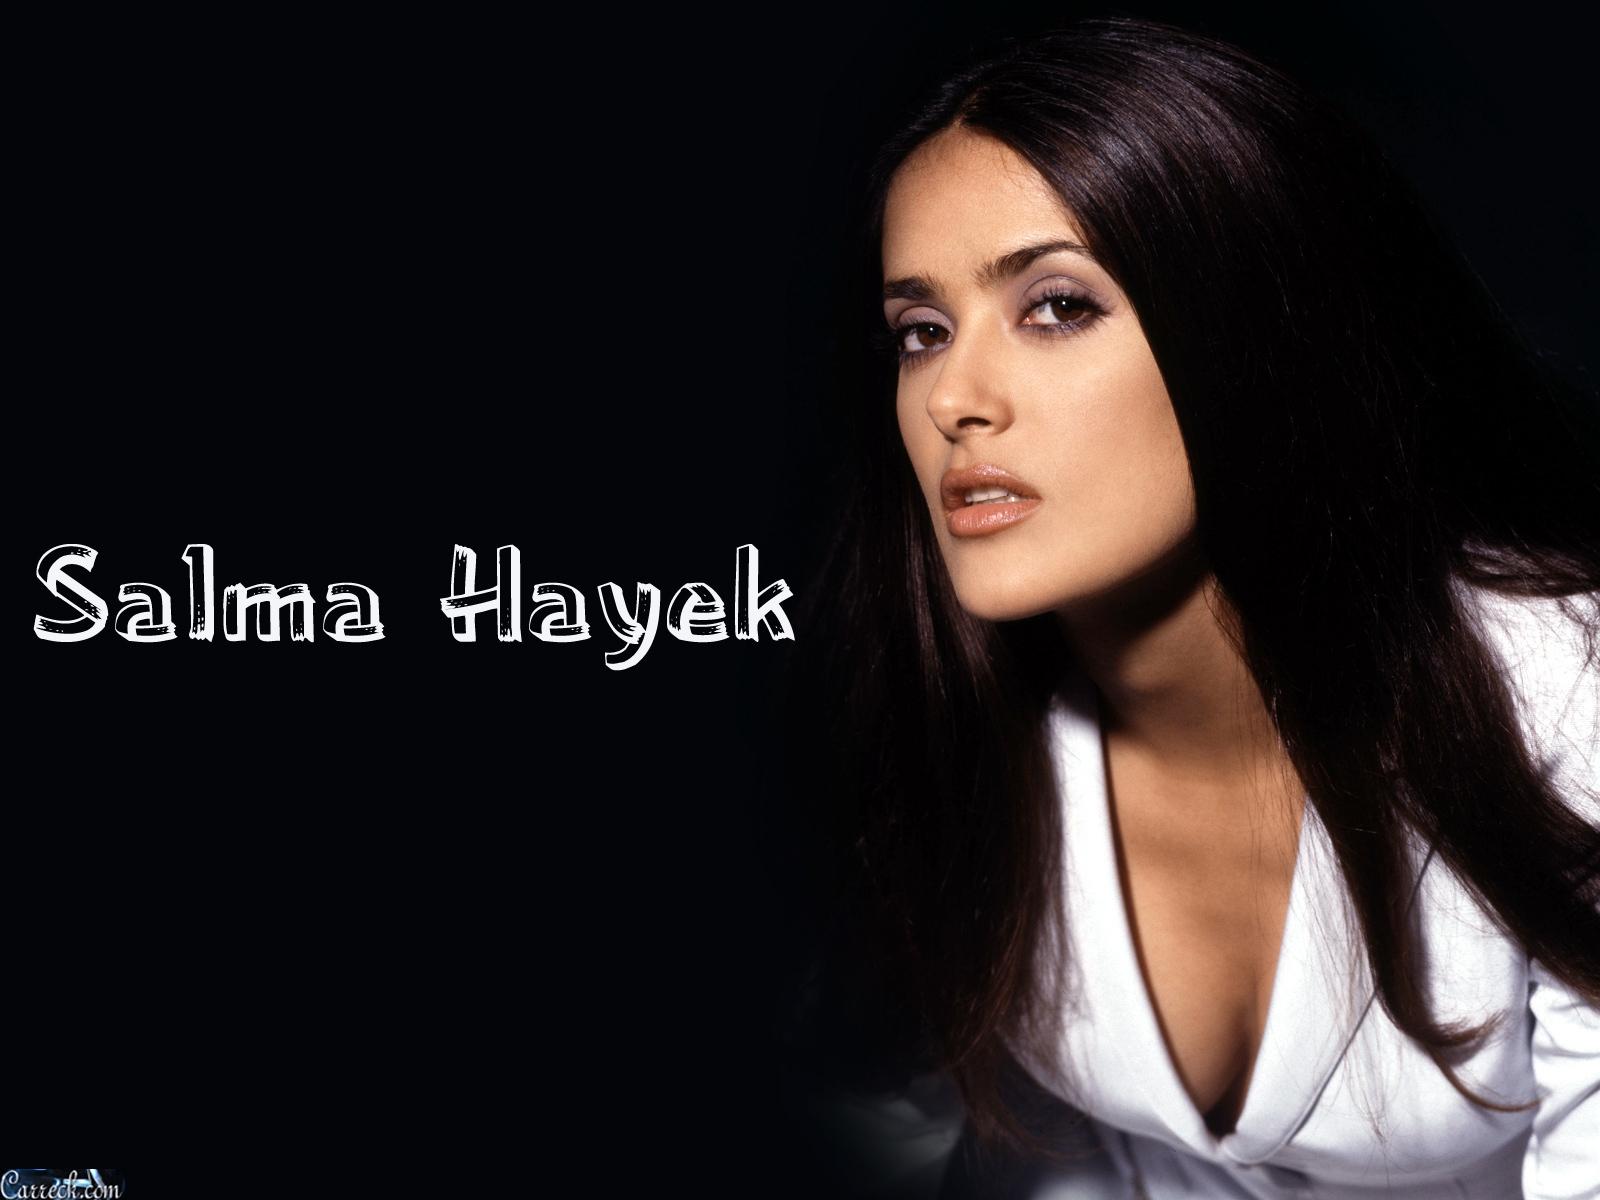 Salma Hayek HD wallpapers download 1600x1200